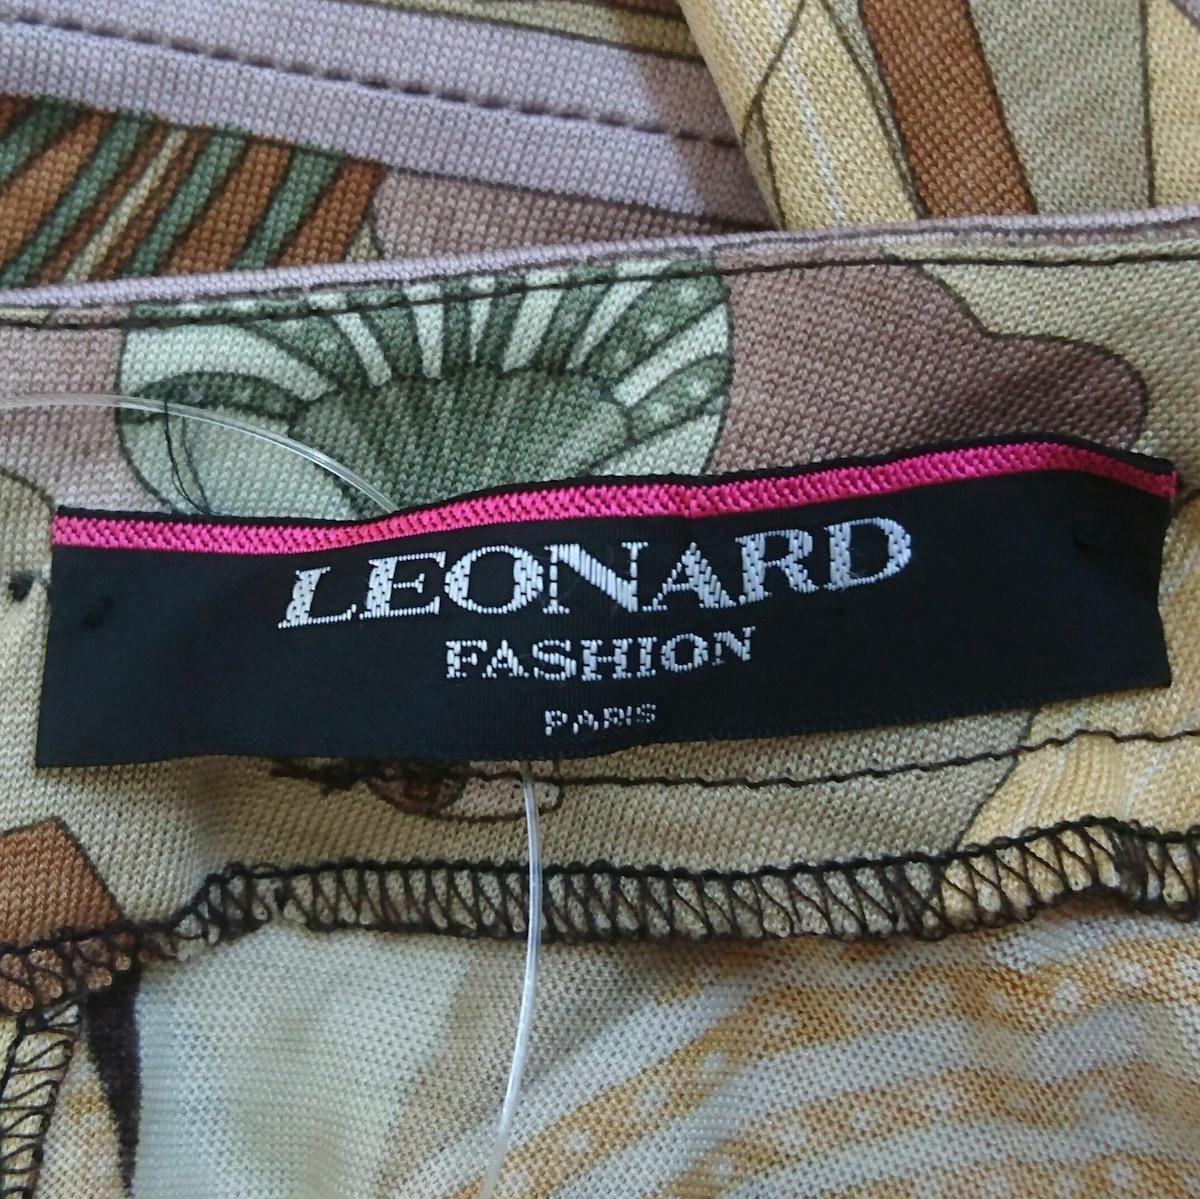 LEONARDO(レオナルド)のワンピース